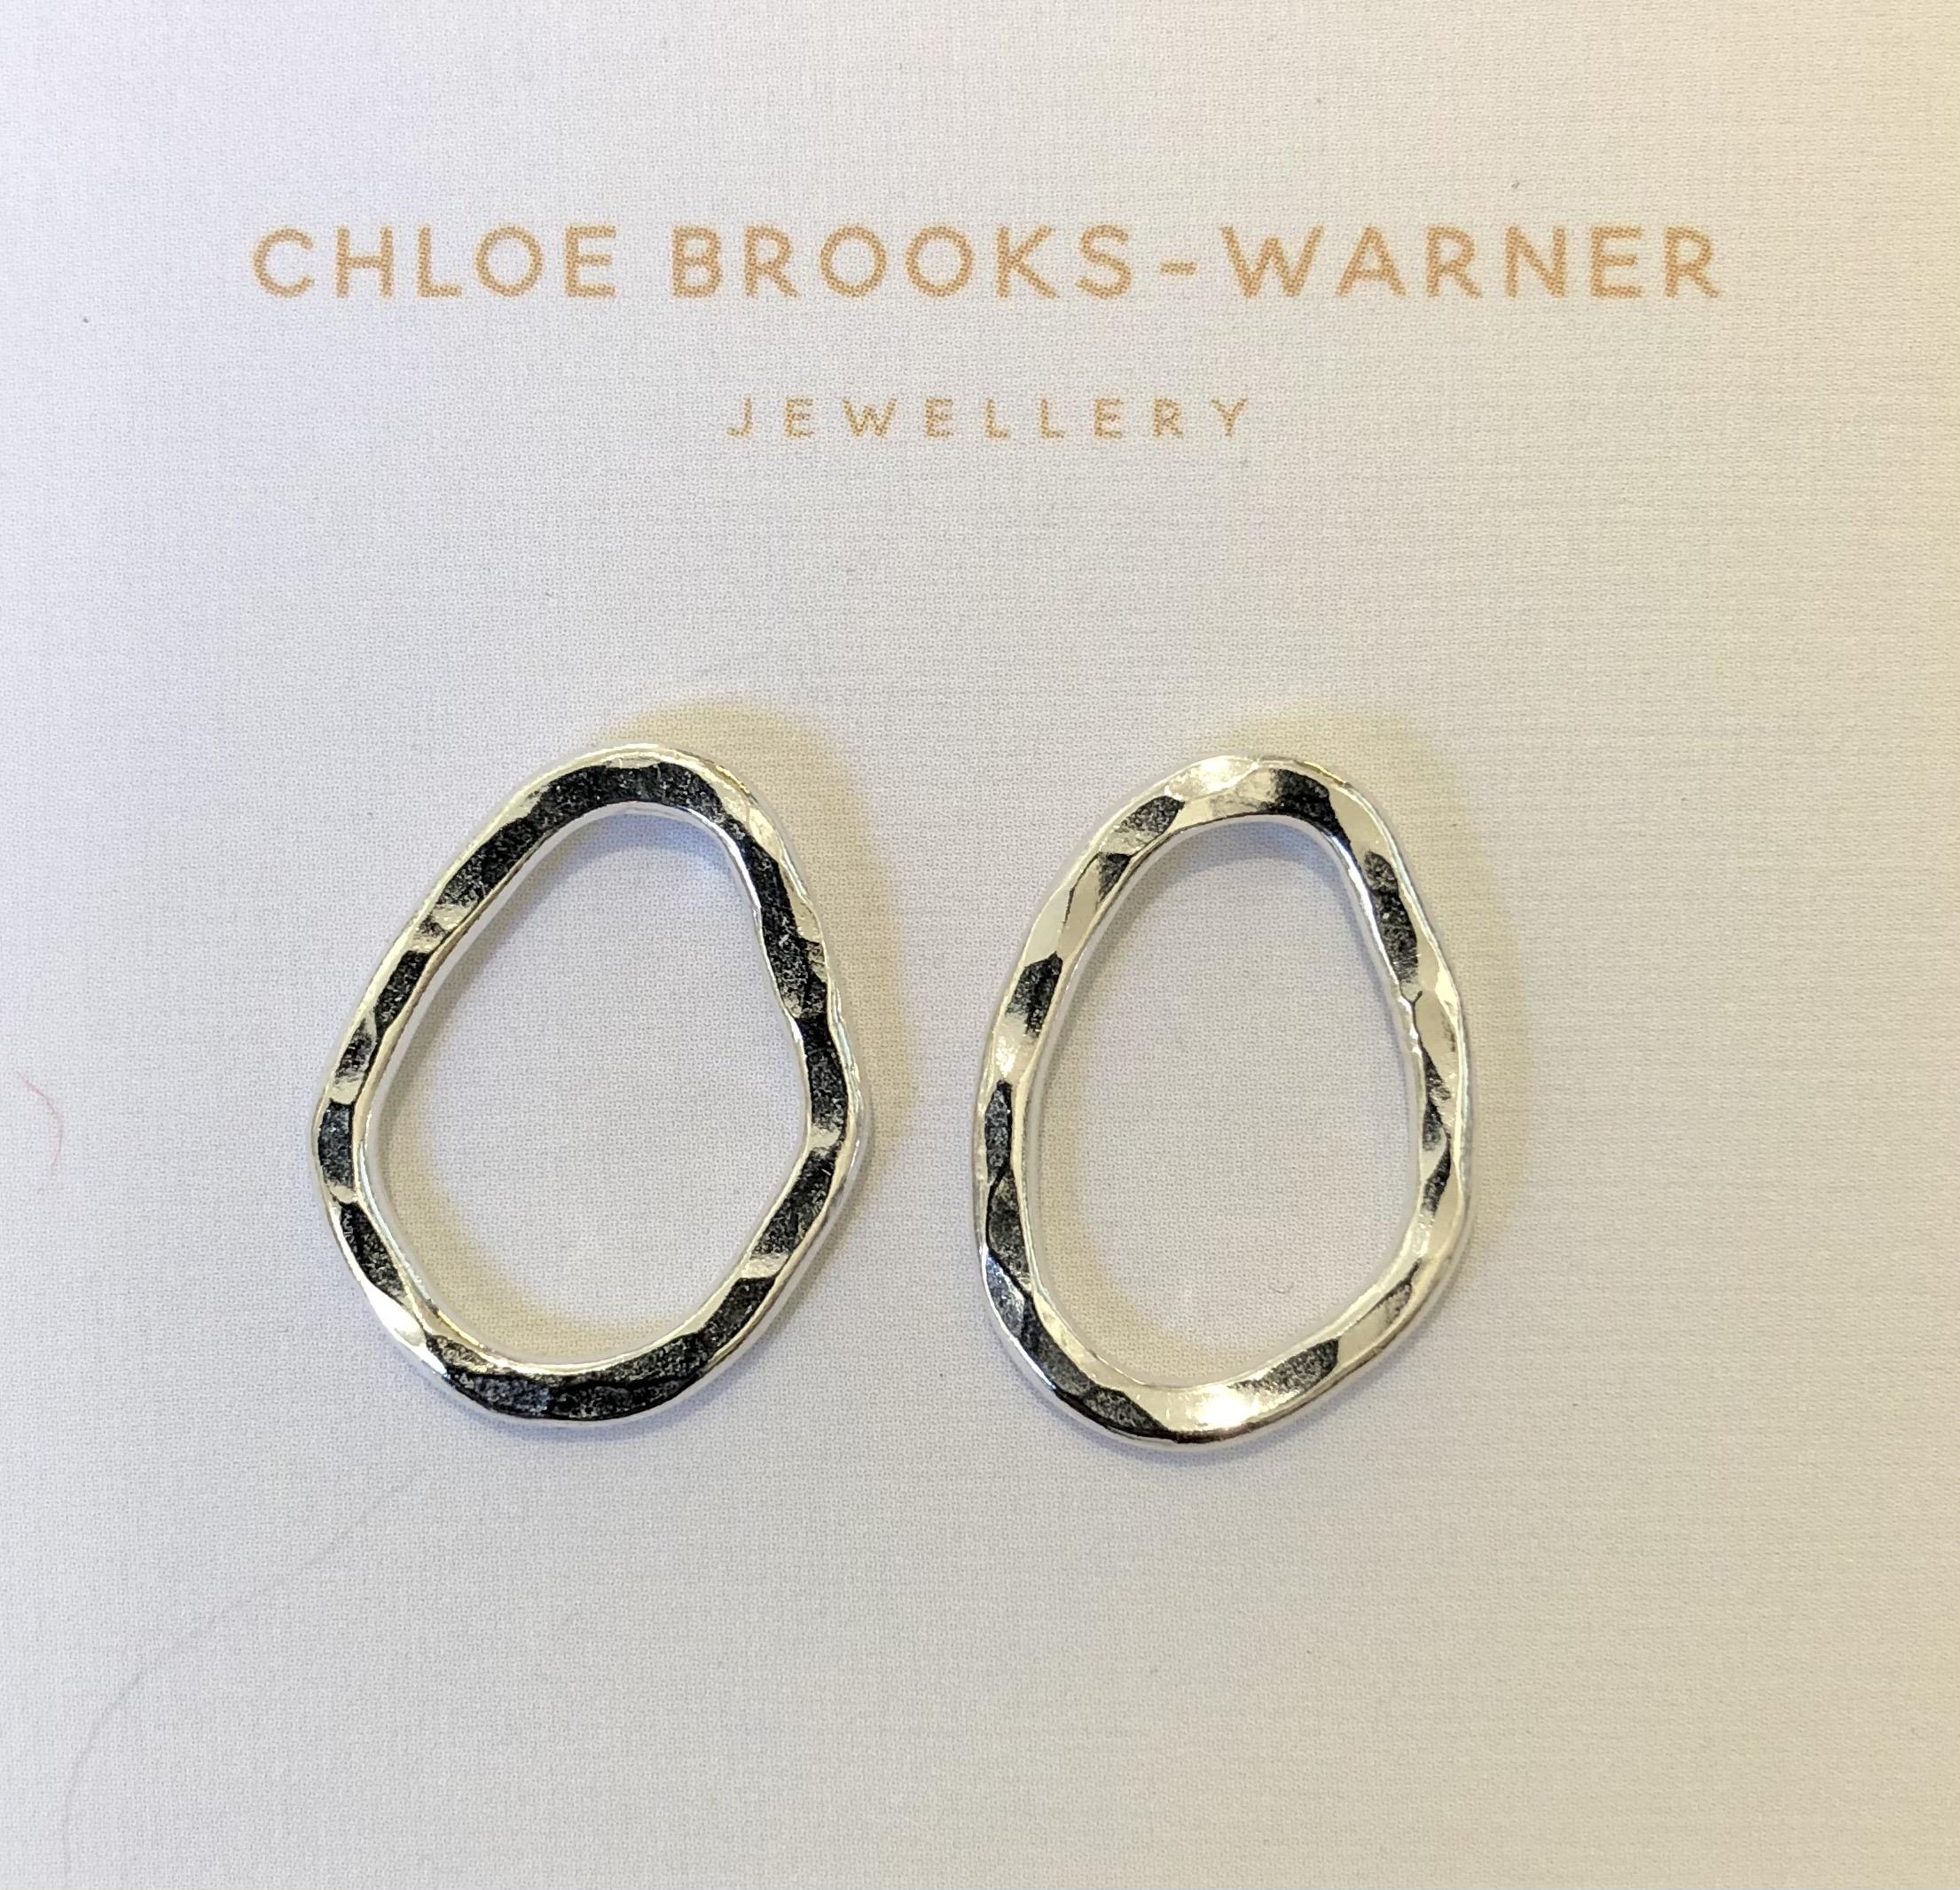 Silver Sun Studs- Handmade by Devon jeweller Chloe Brooks Warner